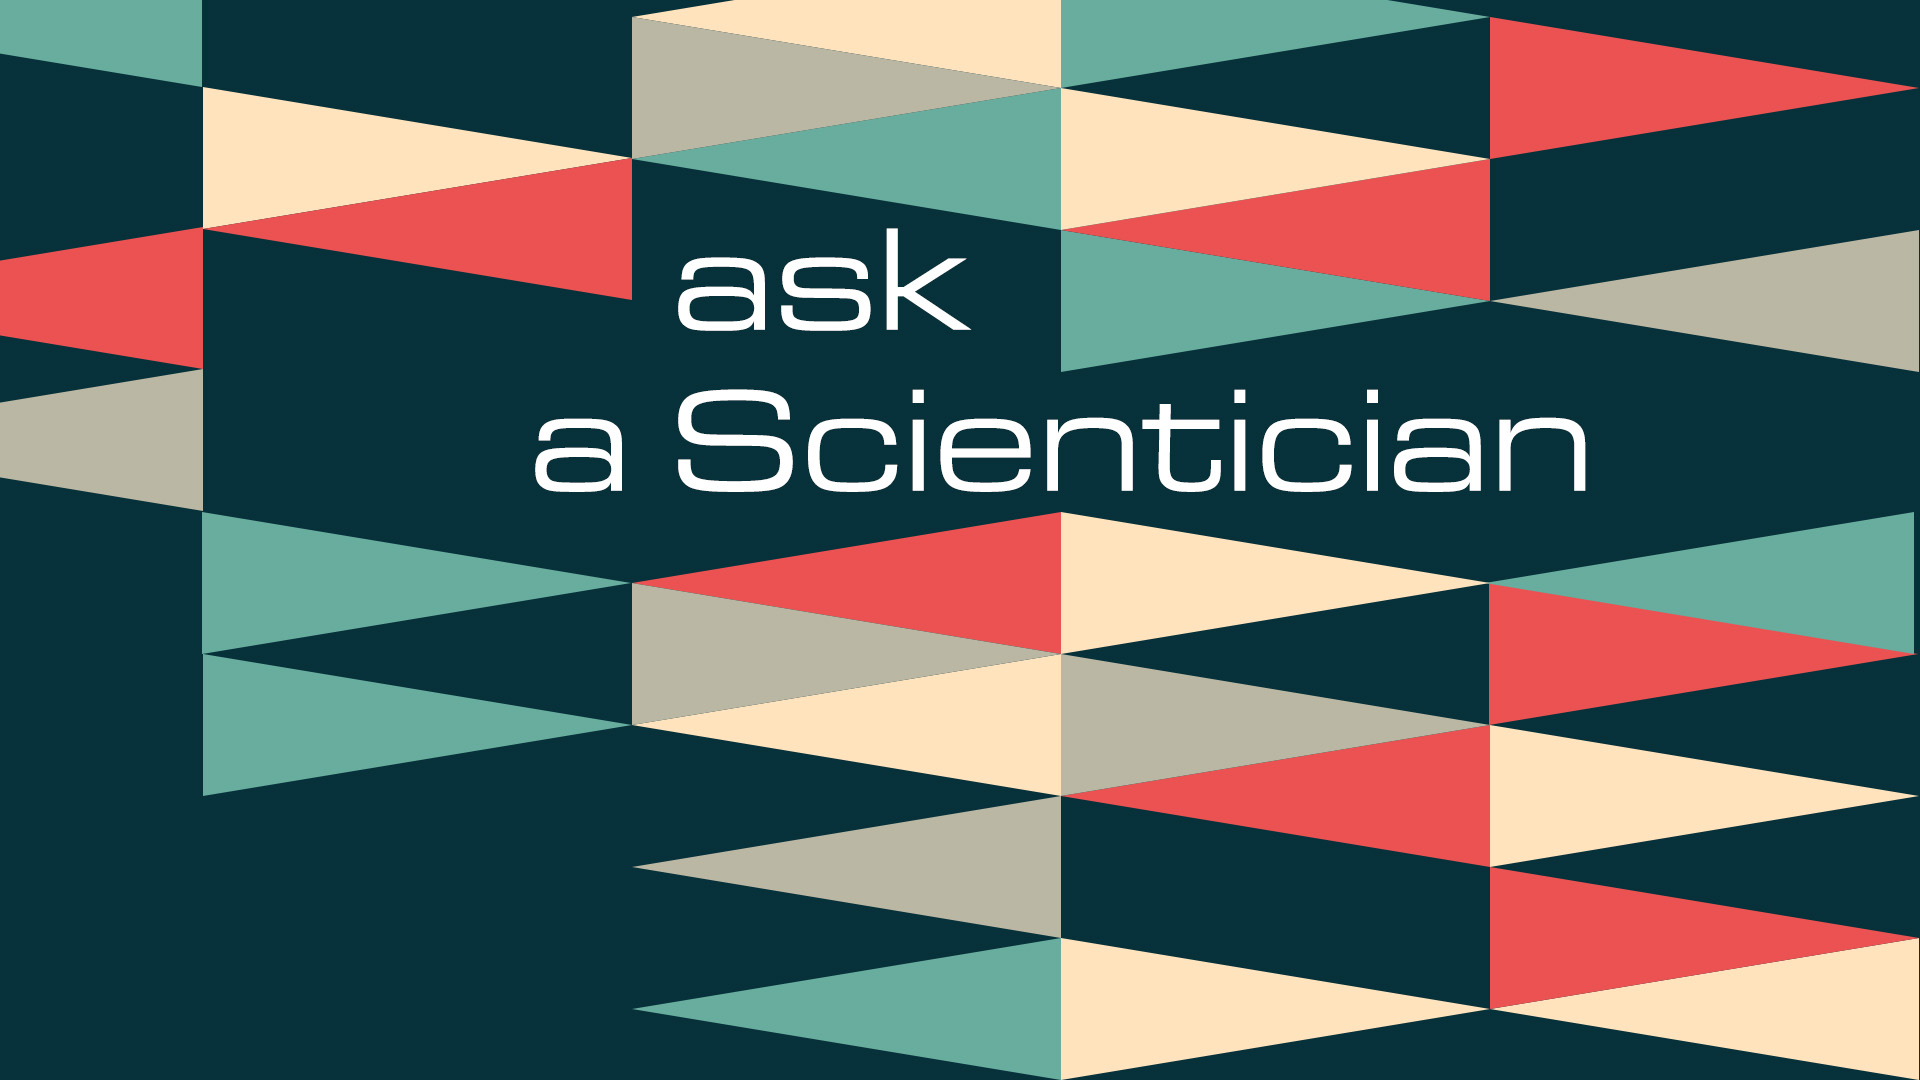 Ask a Scientician